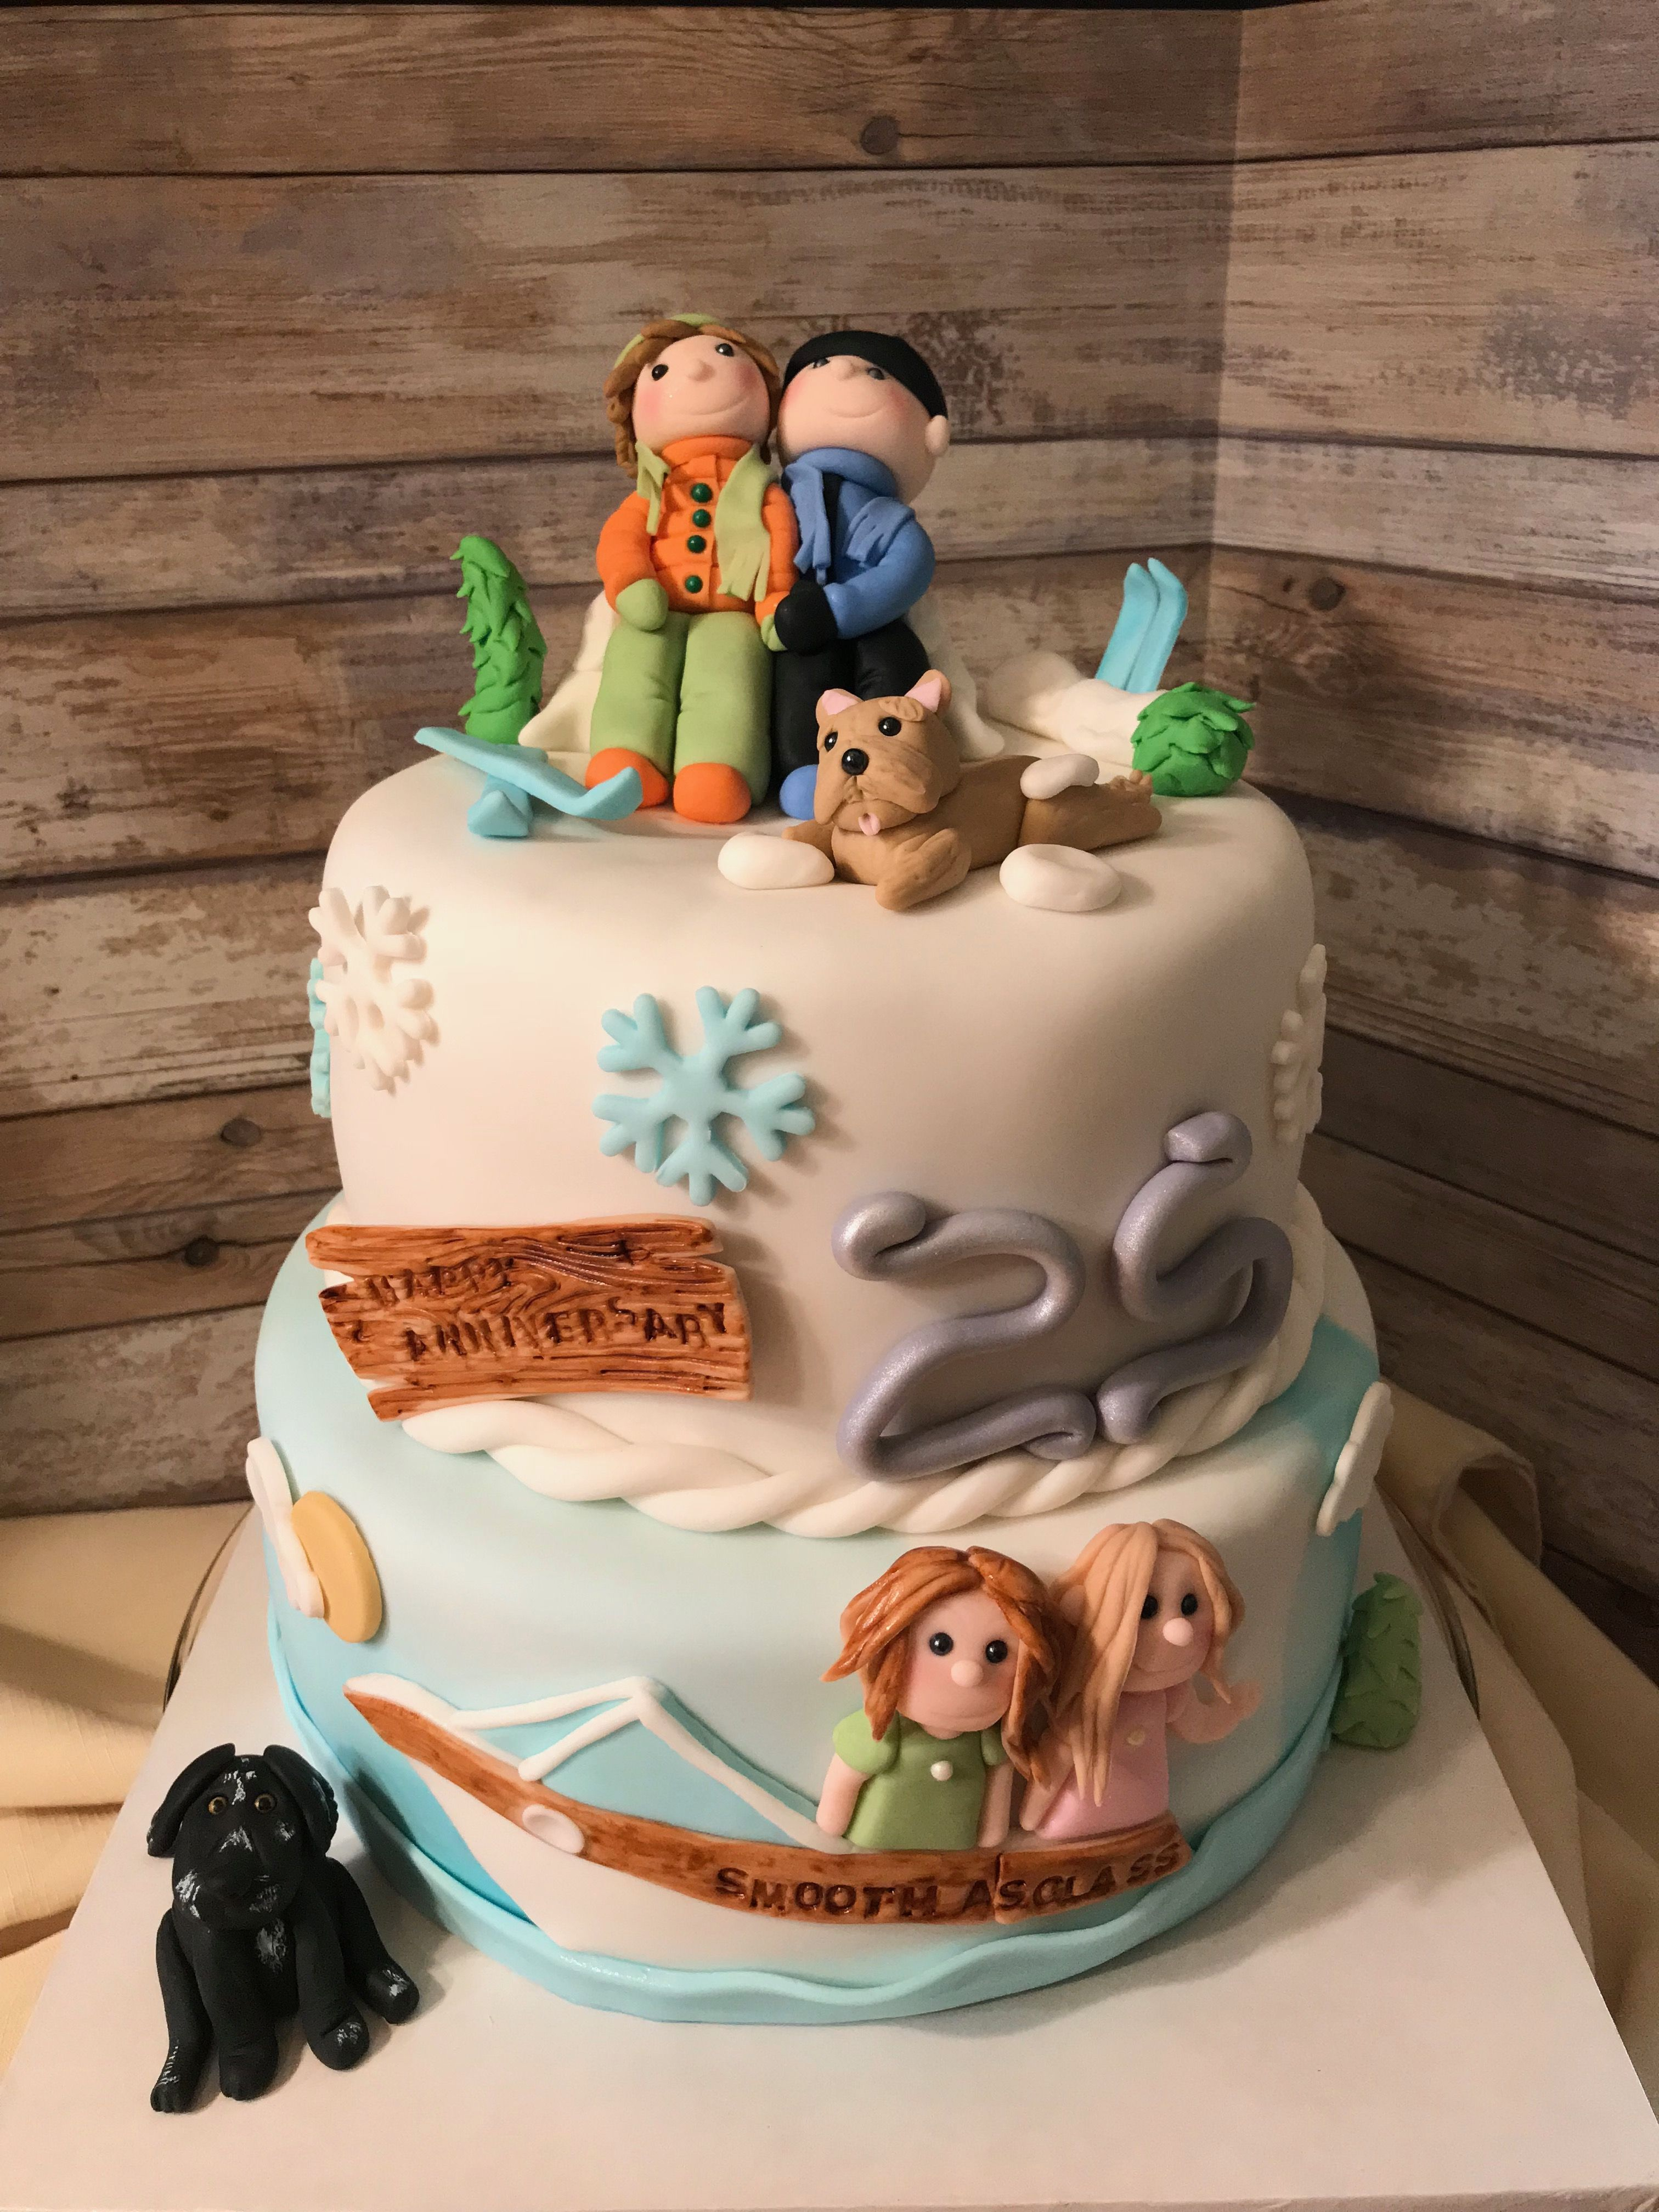 Cake with a story cake anniversary cake cake decorating